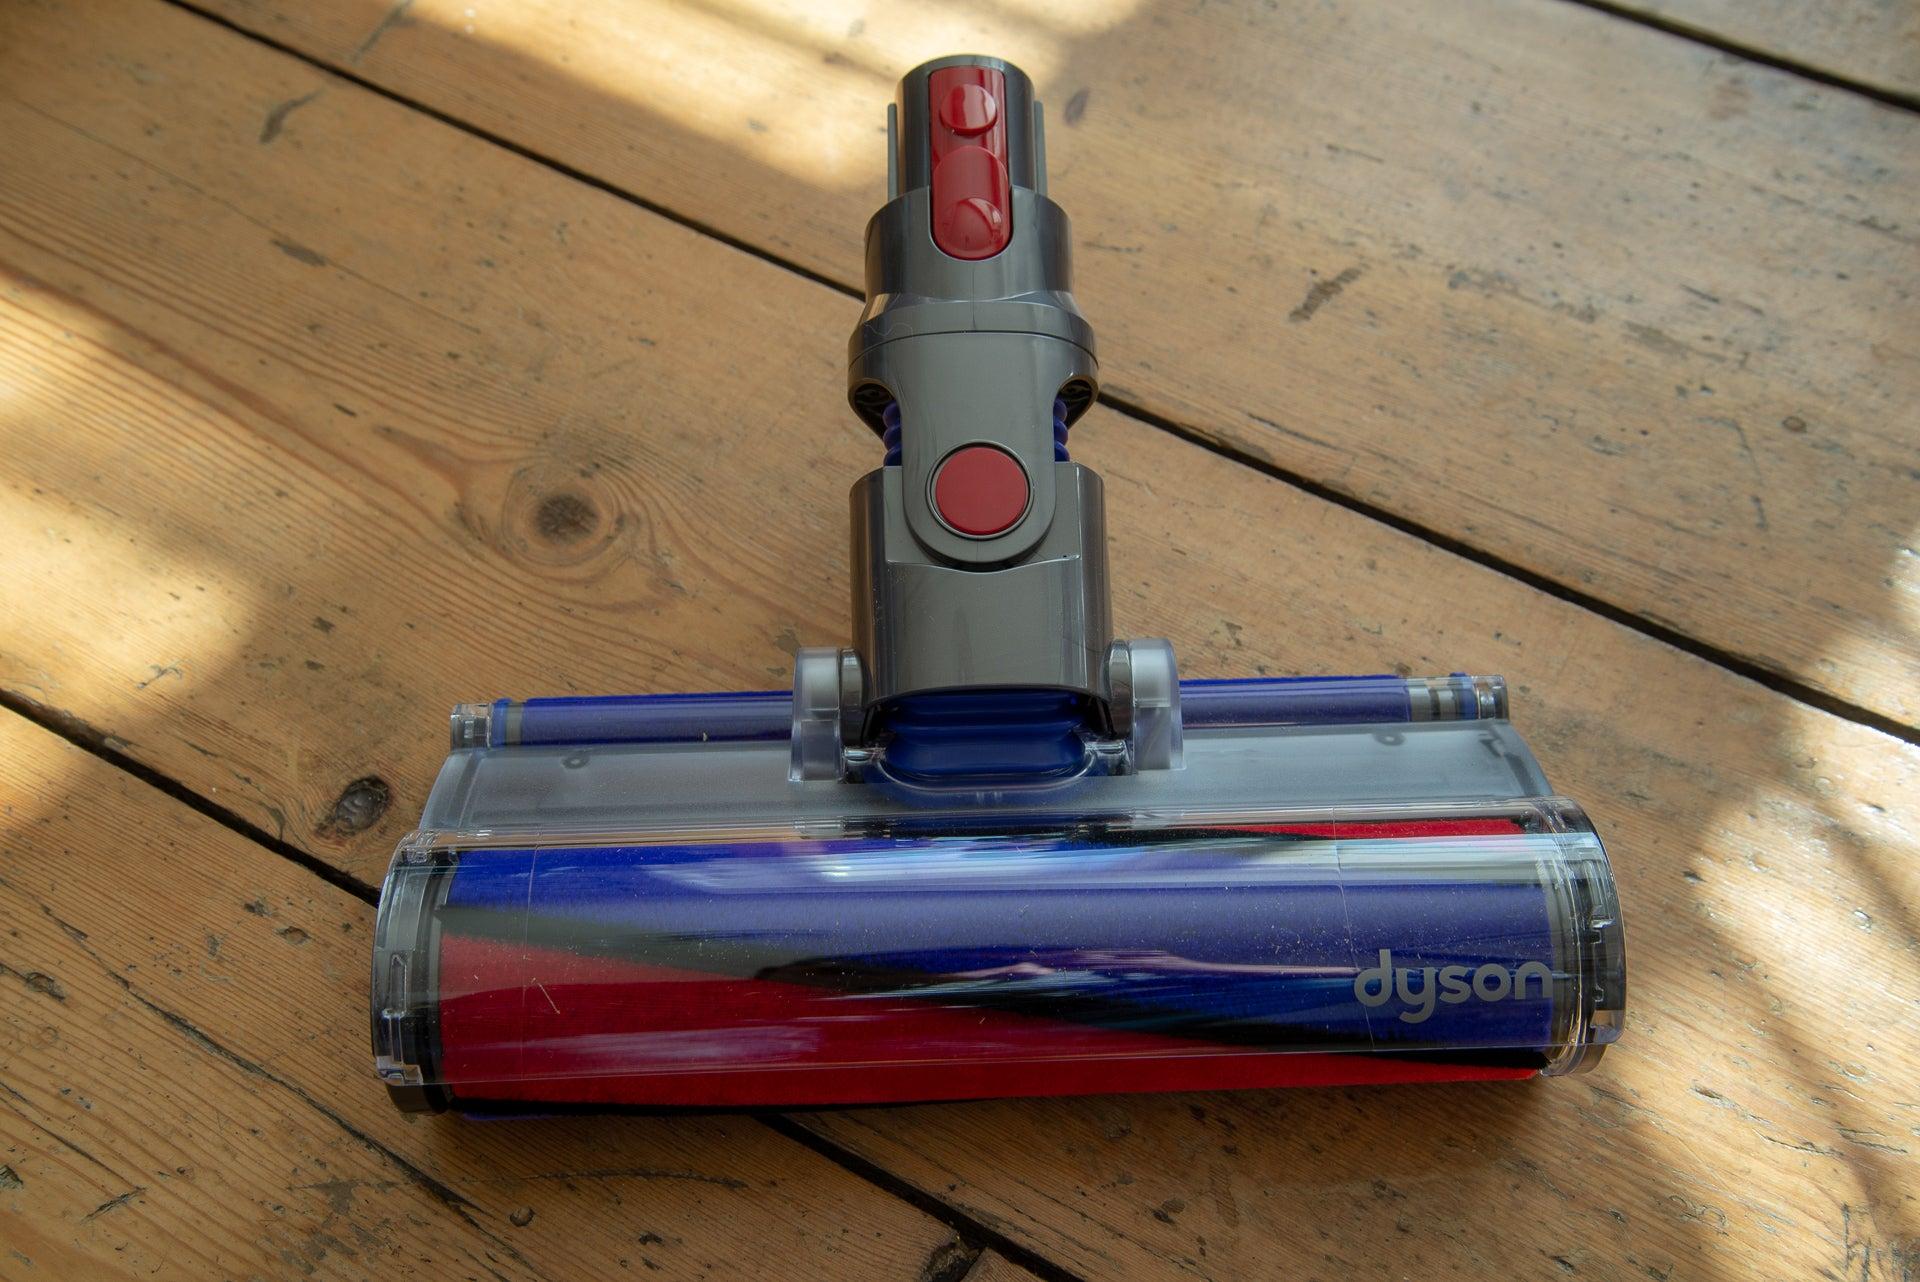 Dyson V11 Absolute soft floor head